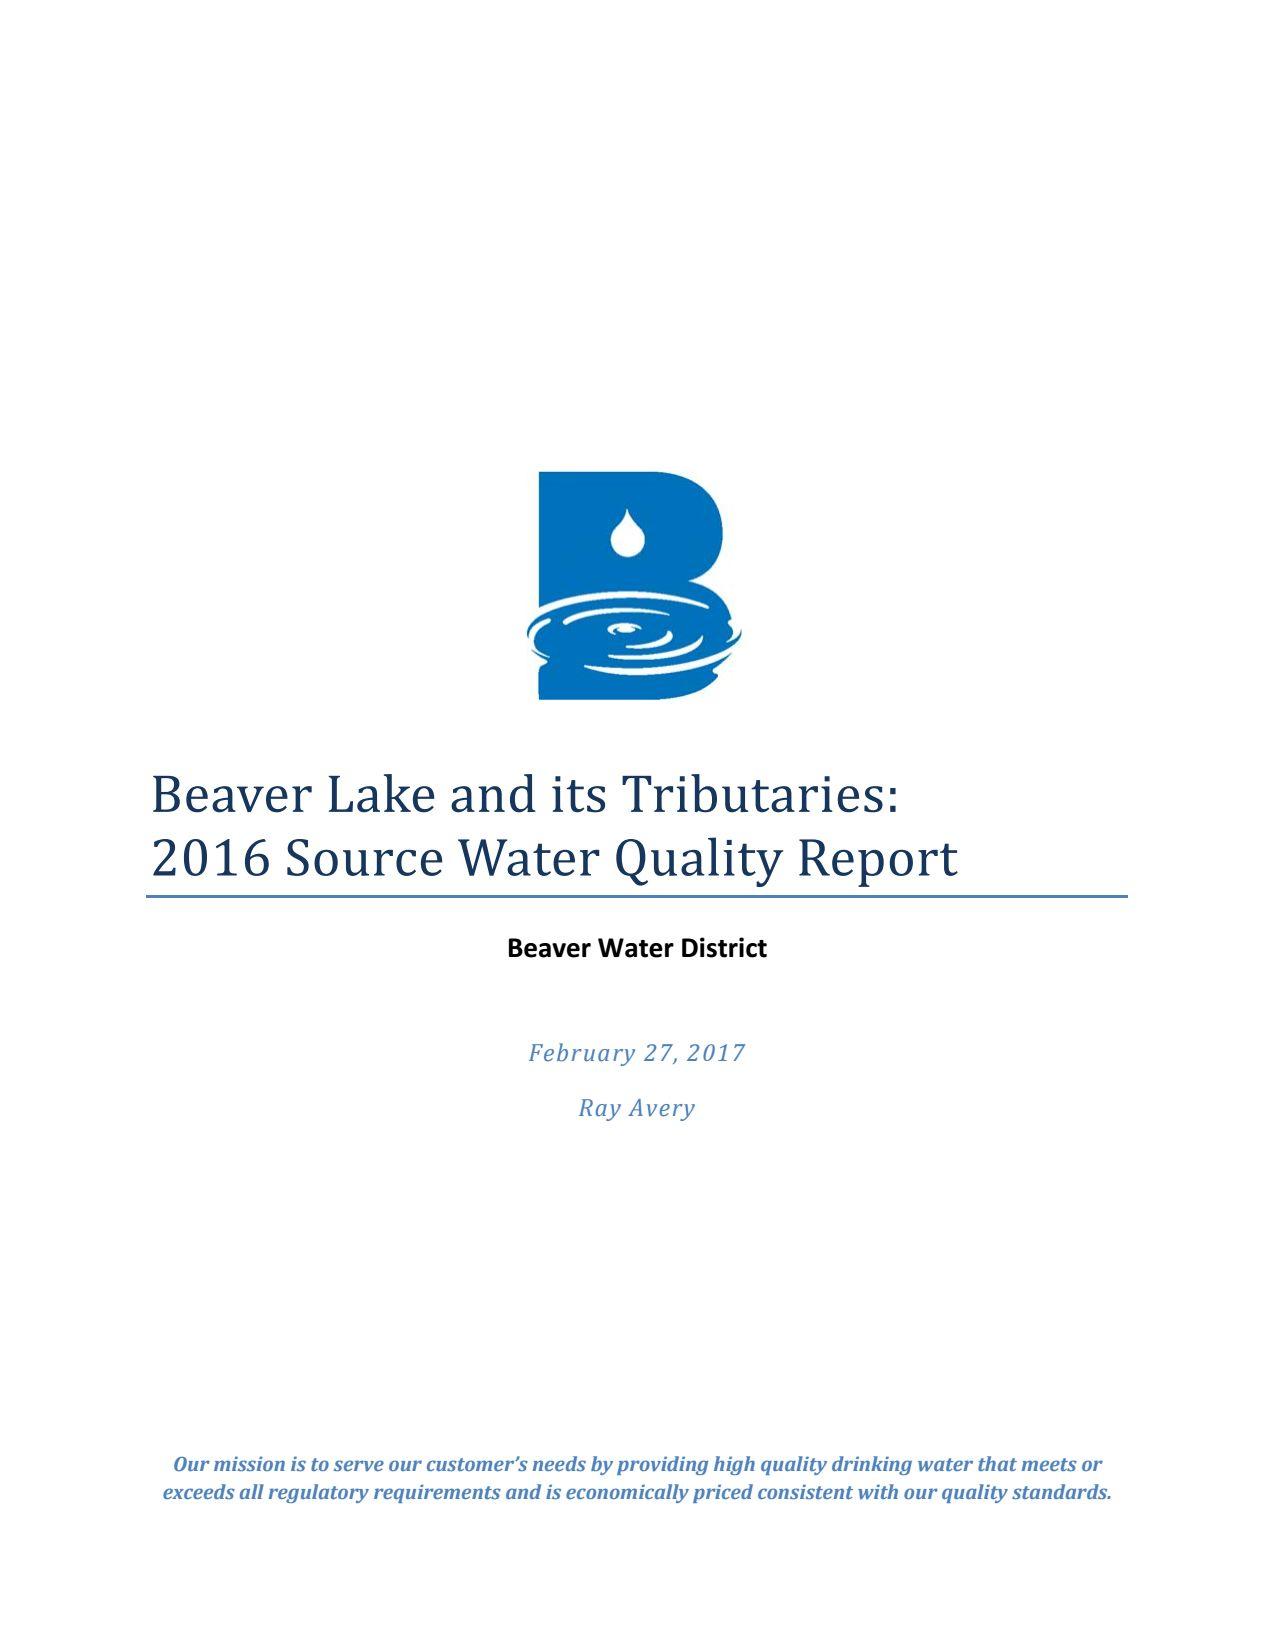 2016 Beaver Lake Water Quality Report